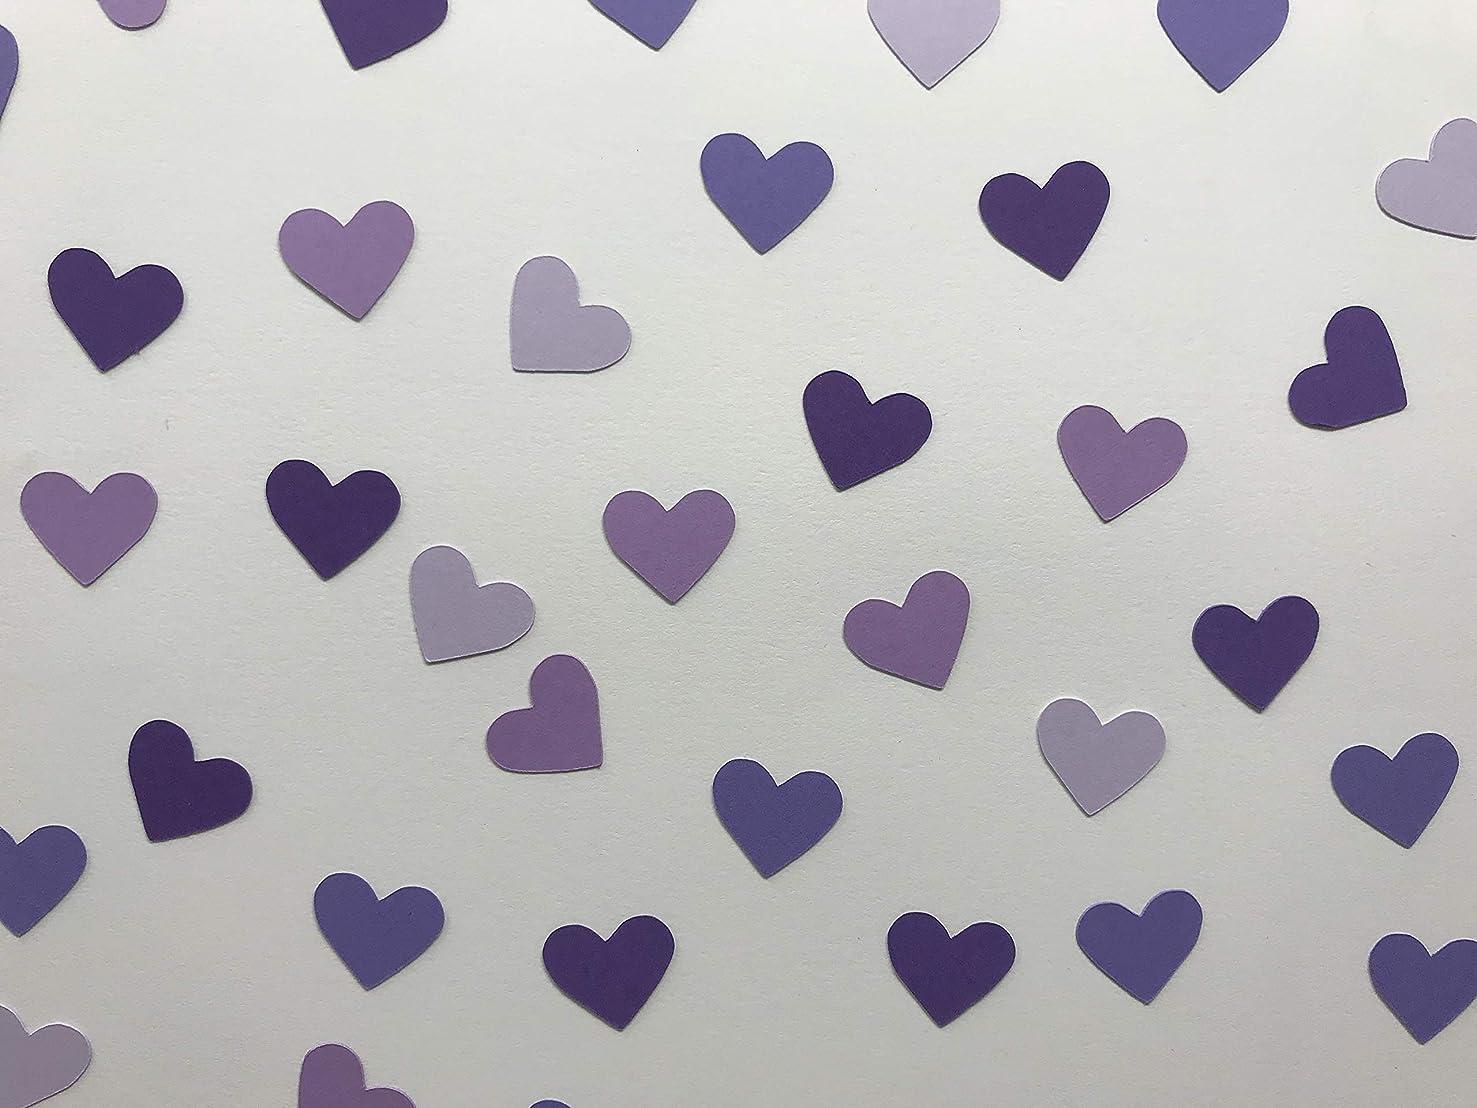 Shades of Purple Heart Confetti - Purple Wedding Decorations - Purple Bridal Shower Decorations - Heart Decorations - Purple Baby Shower - 400 pieces